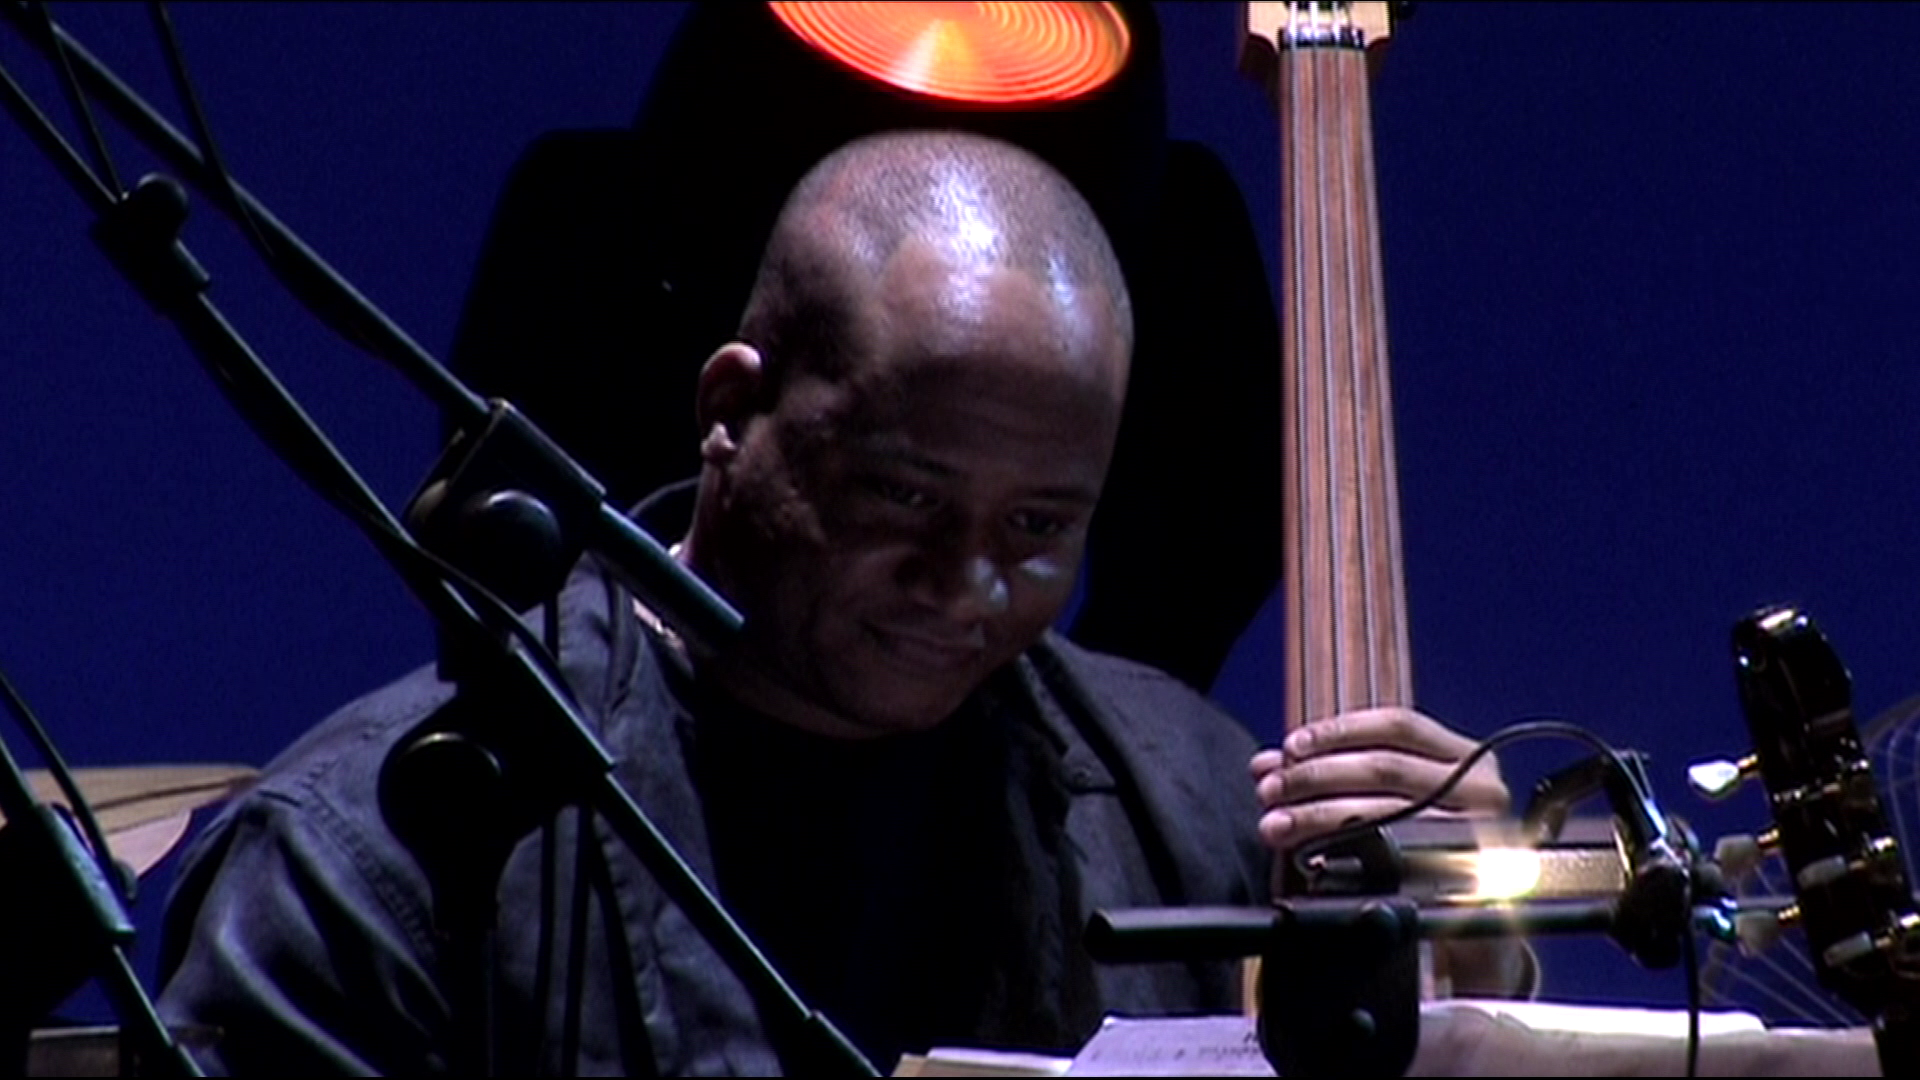 2009 Al Di Meola - Morocco Fantasia - World Sinfonia Live (2012) [Blu-ray] 2